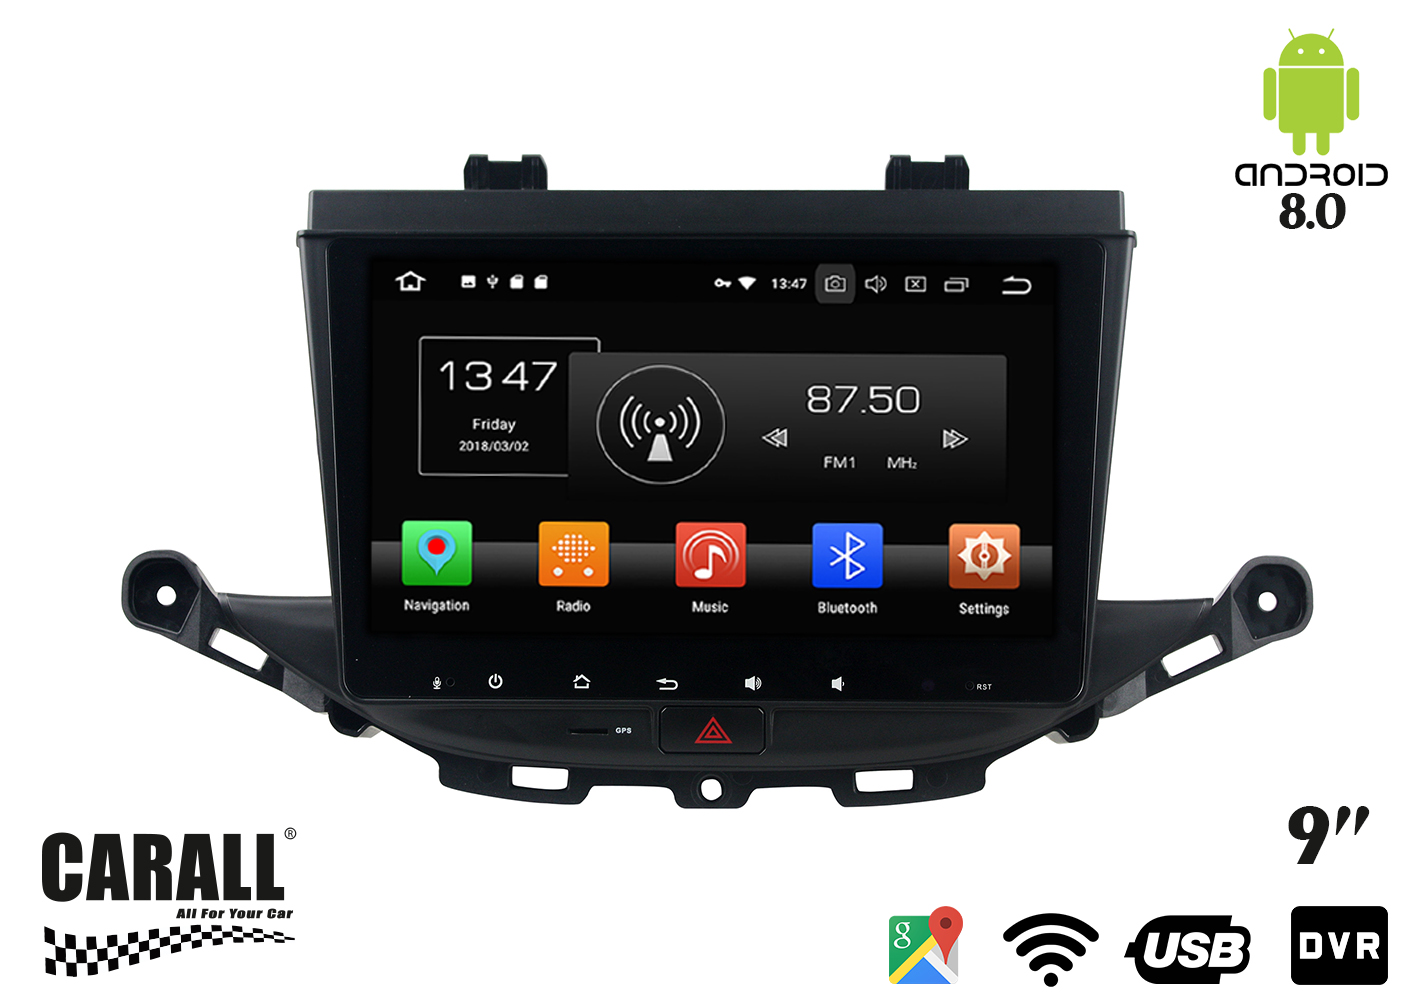 Autoradio Android 8,0 Opel Astra K GPS DVD USB SD WI-FI Bluetooth Navigatore - KIT